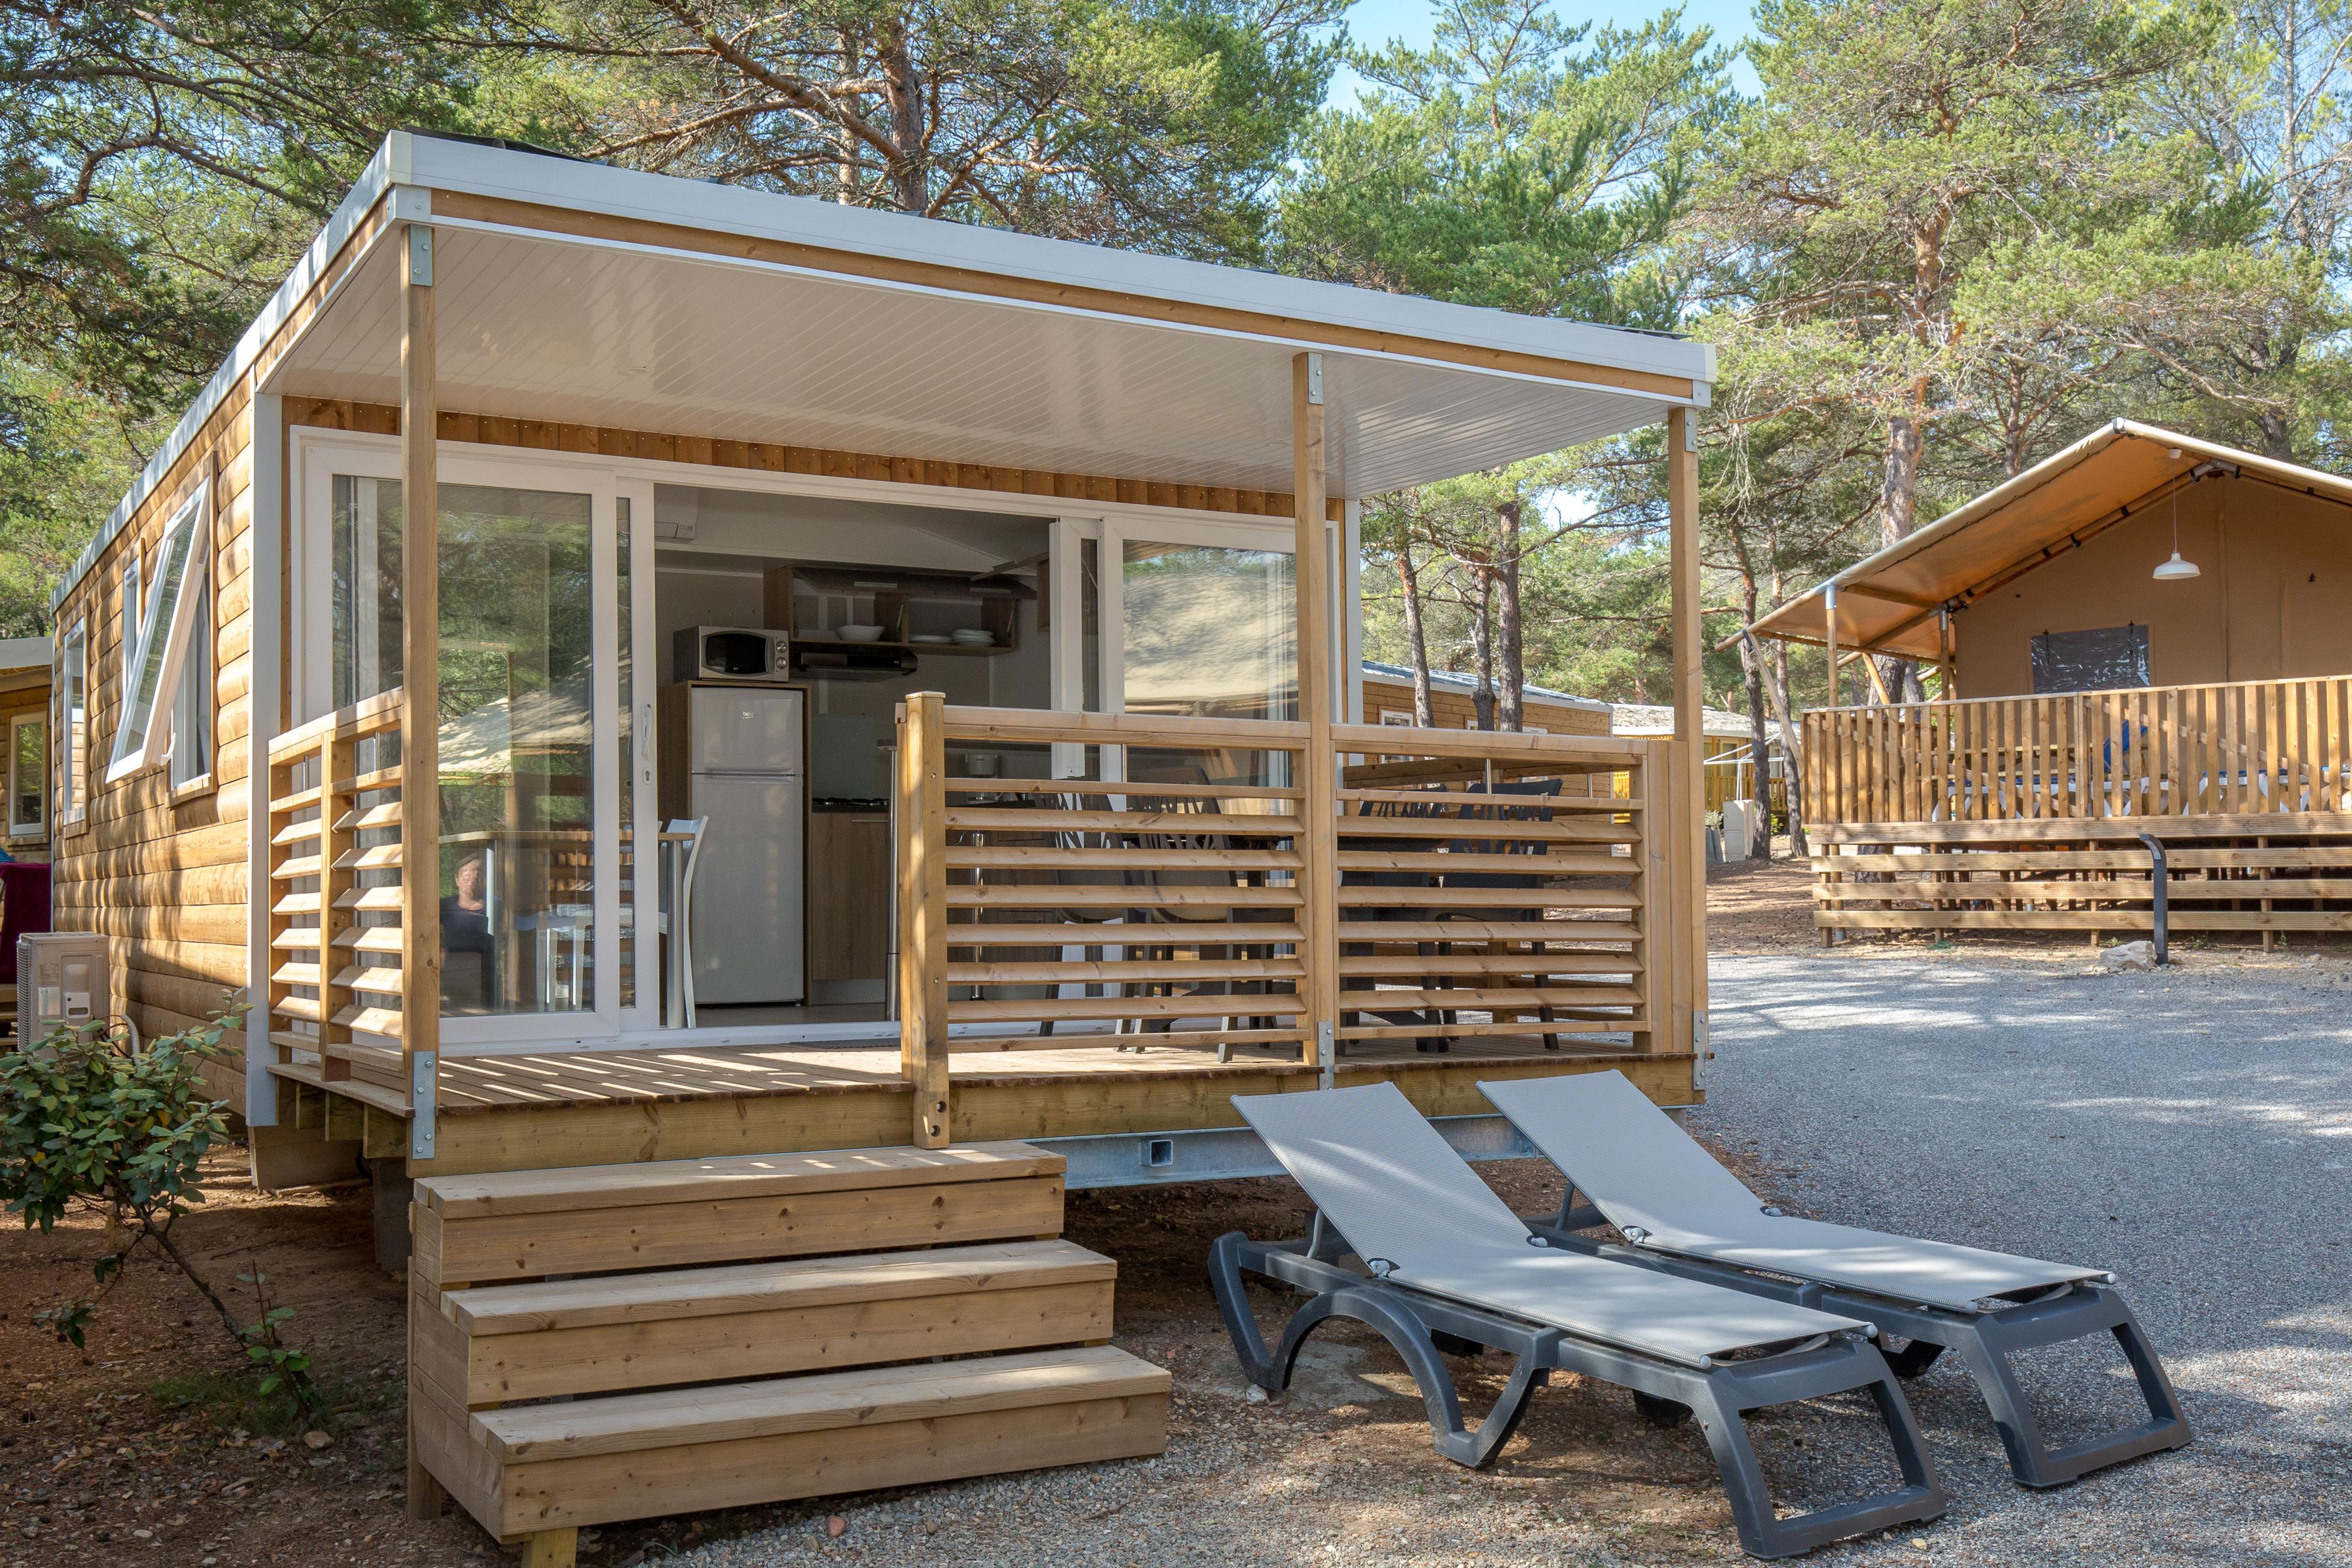 camping 4 étoiles sud de la France